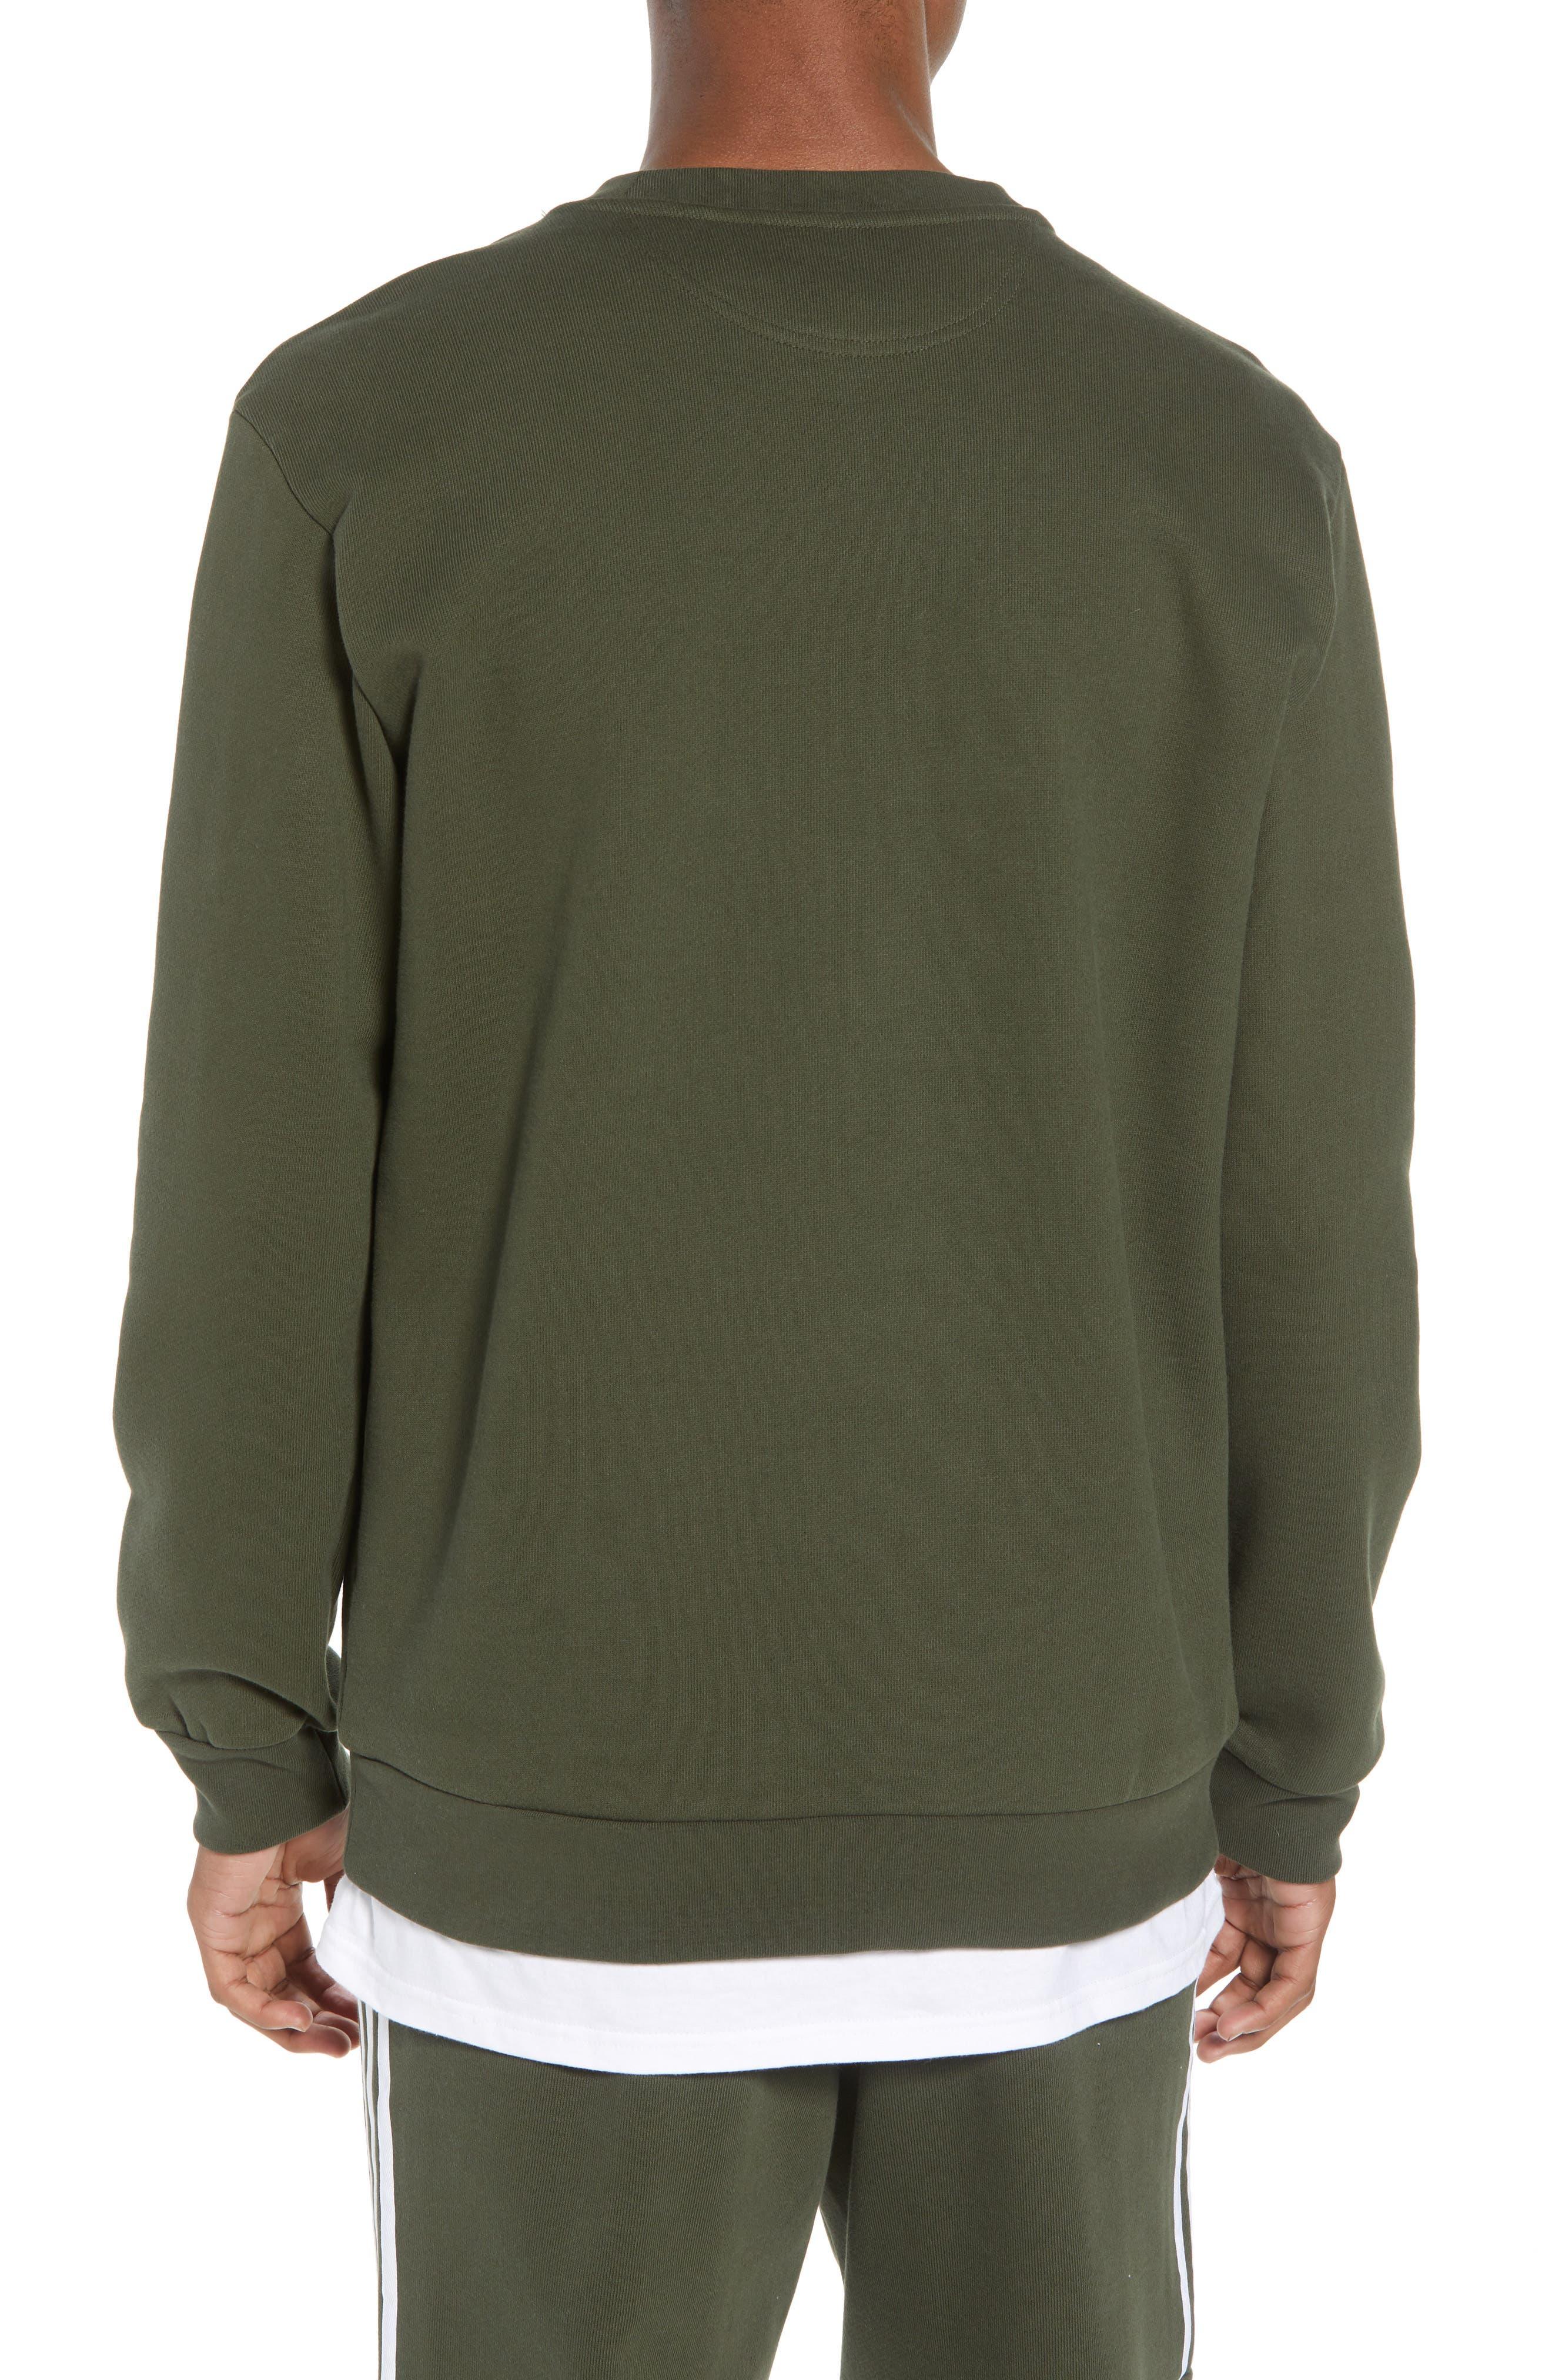 adidas Outline Trefoil Crewneck Sweatshirt,                             Alternate thumbnail 2, color,                             307